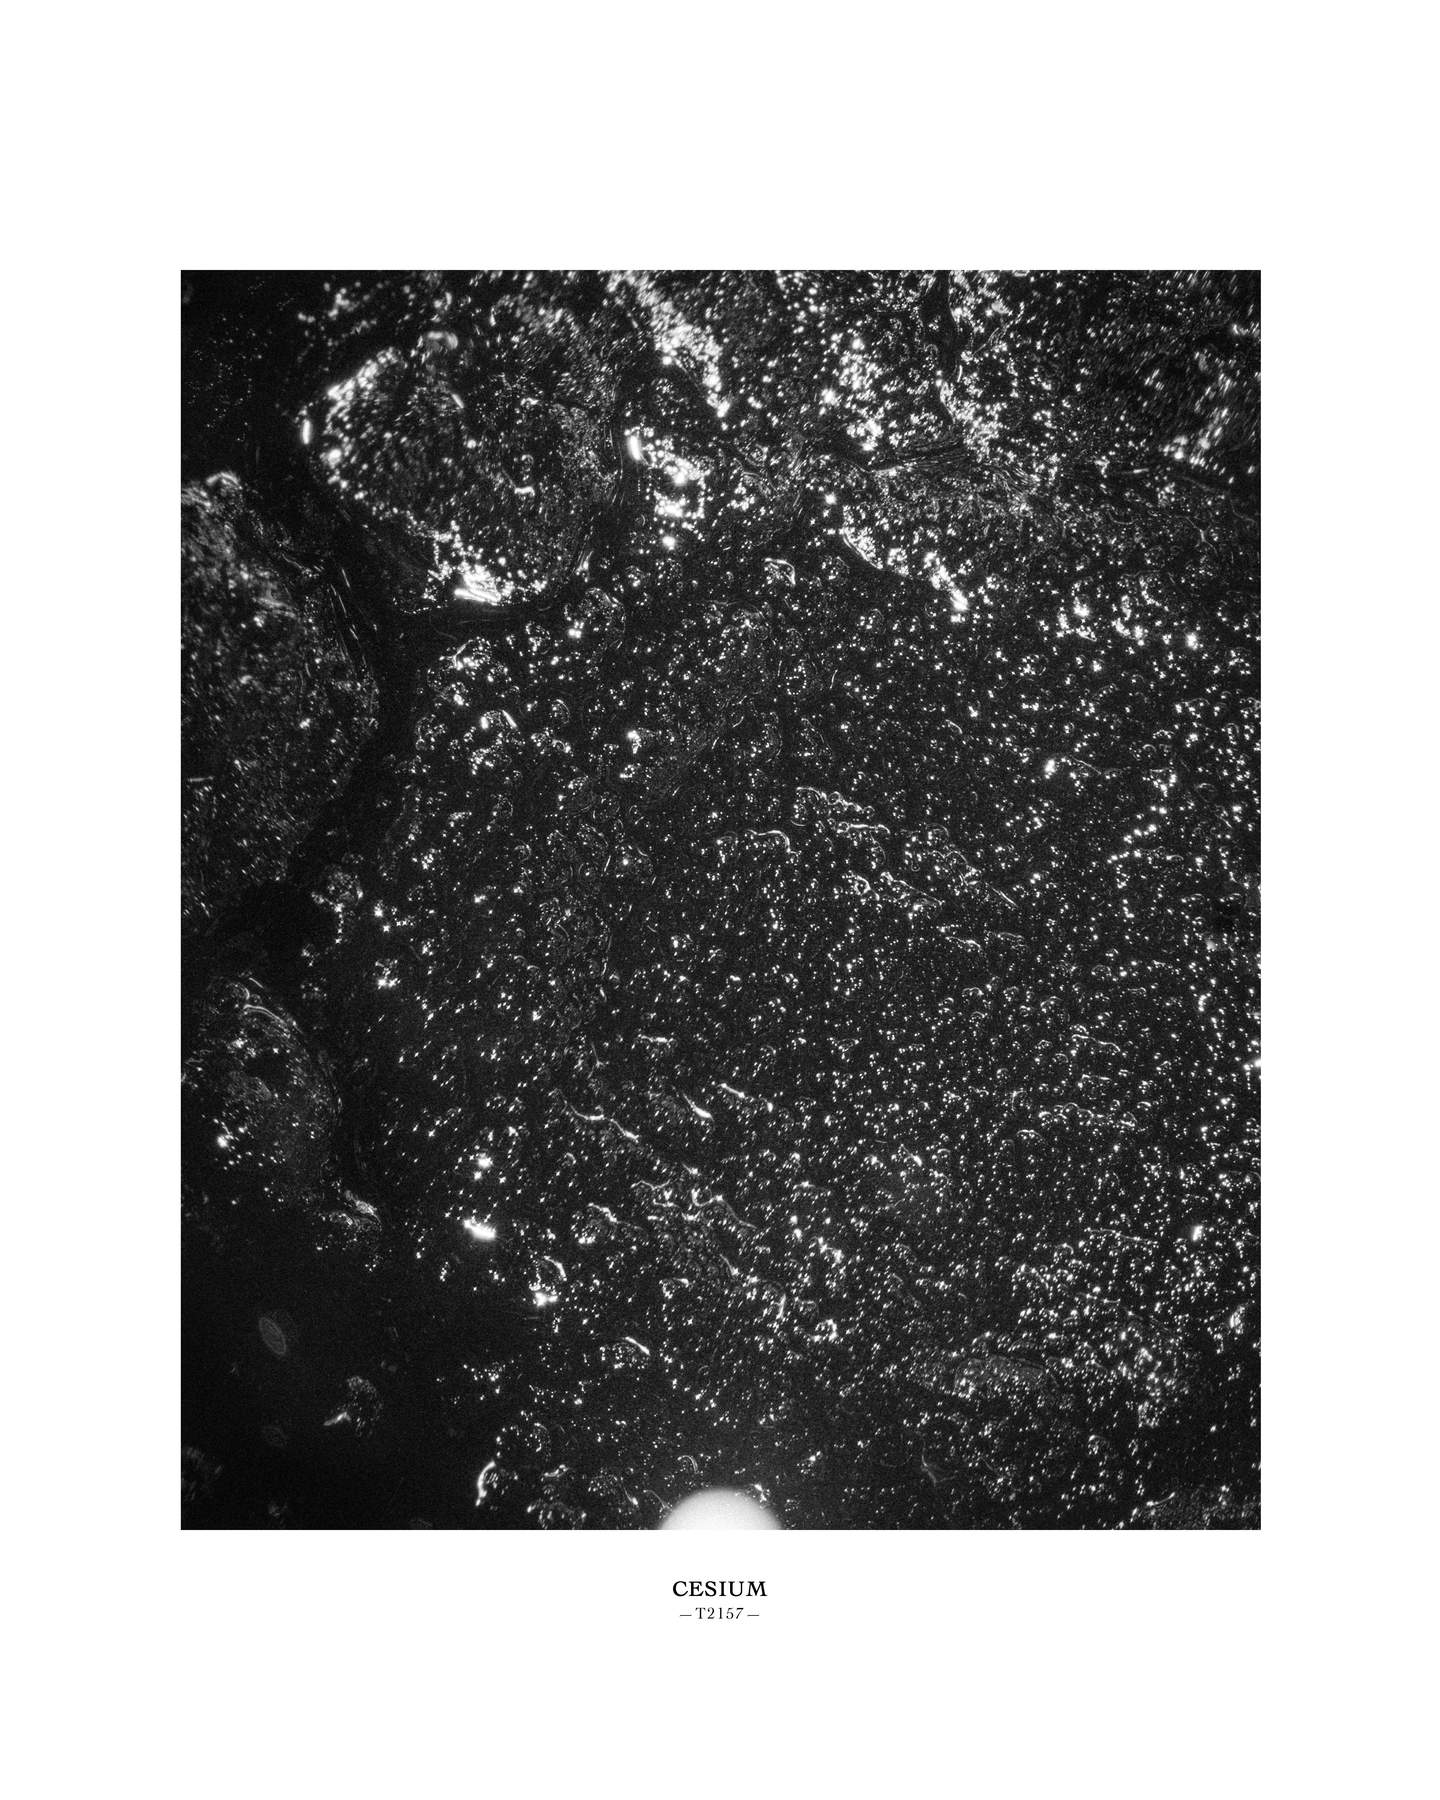 Melik Ohanian, Portrait of Duration — Cesium Series (T2157), 2015, Black and white photograph, 53 x 43 x 5cm (framed), 1_1 + 1 AP